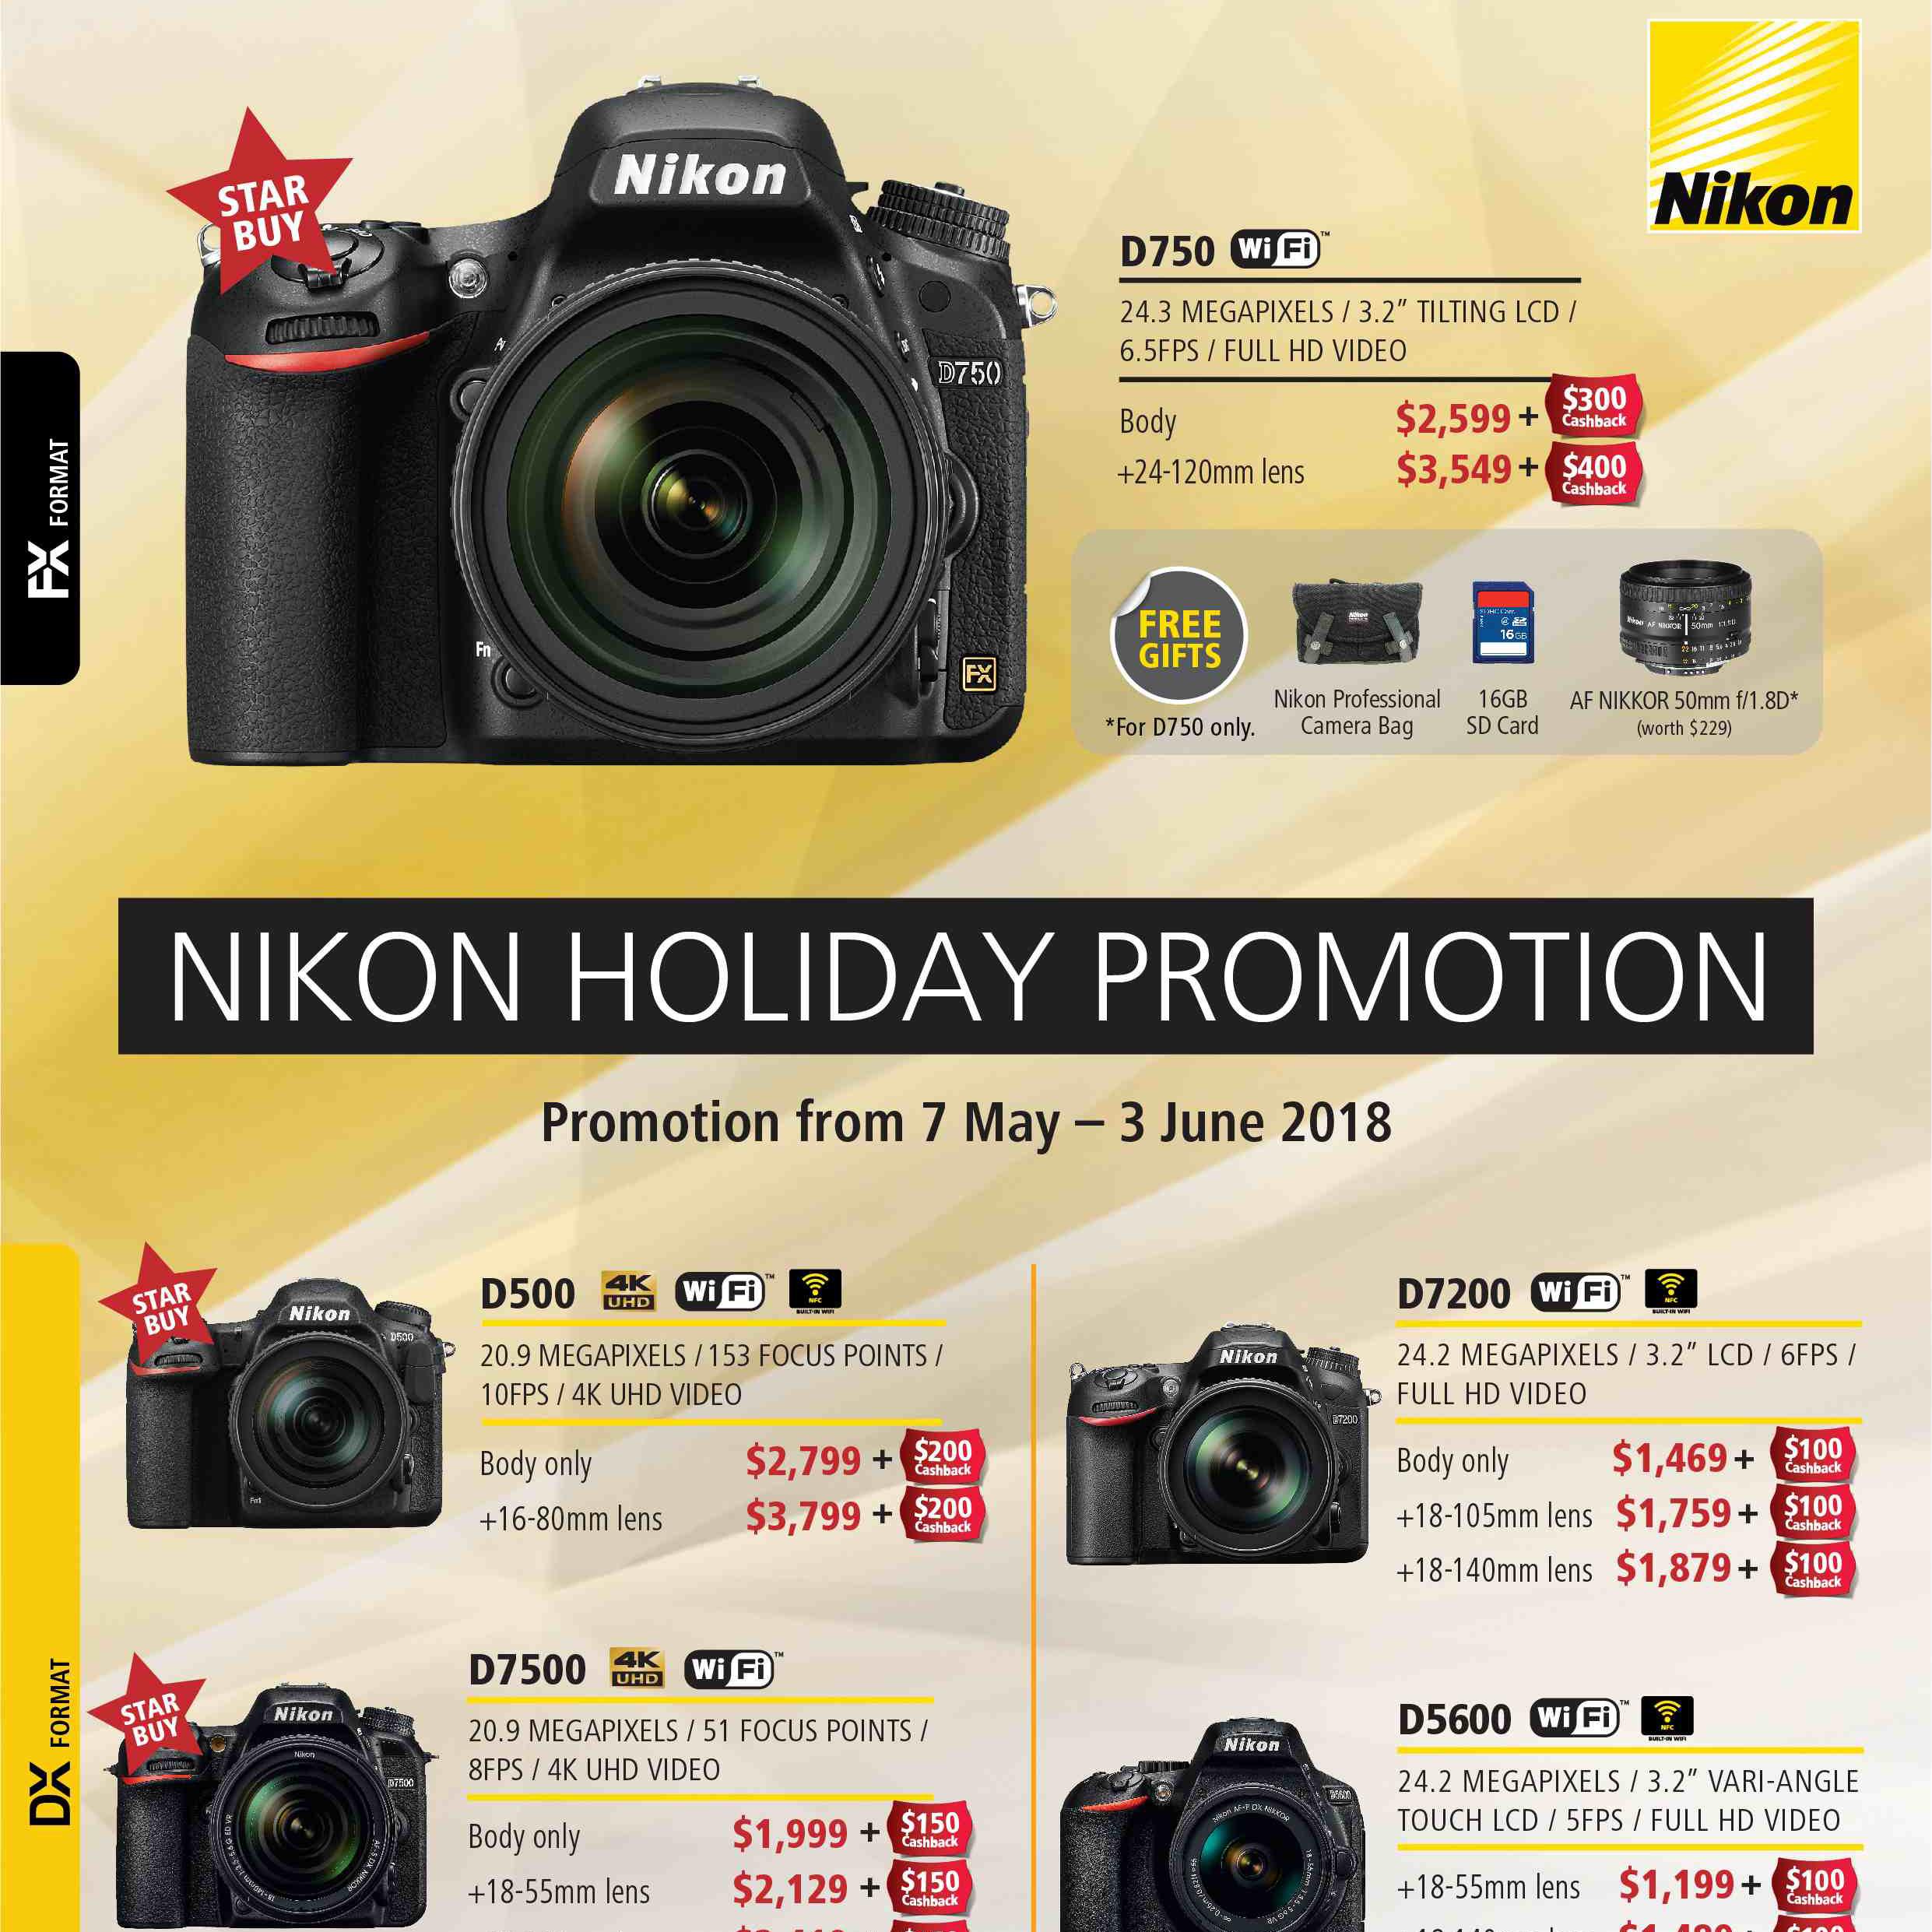 Nikon Holiday Promo